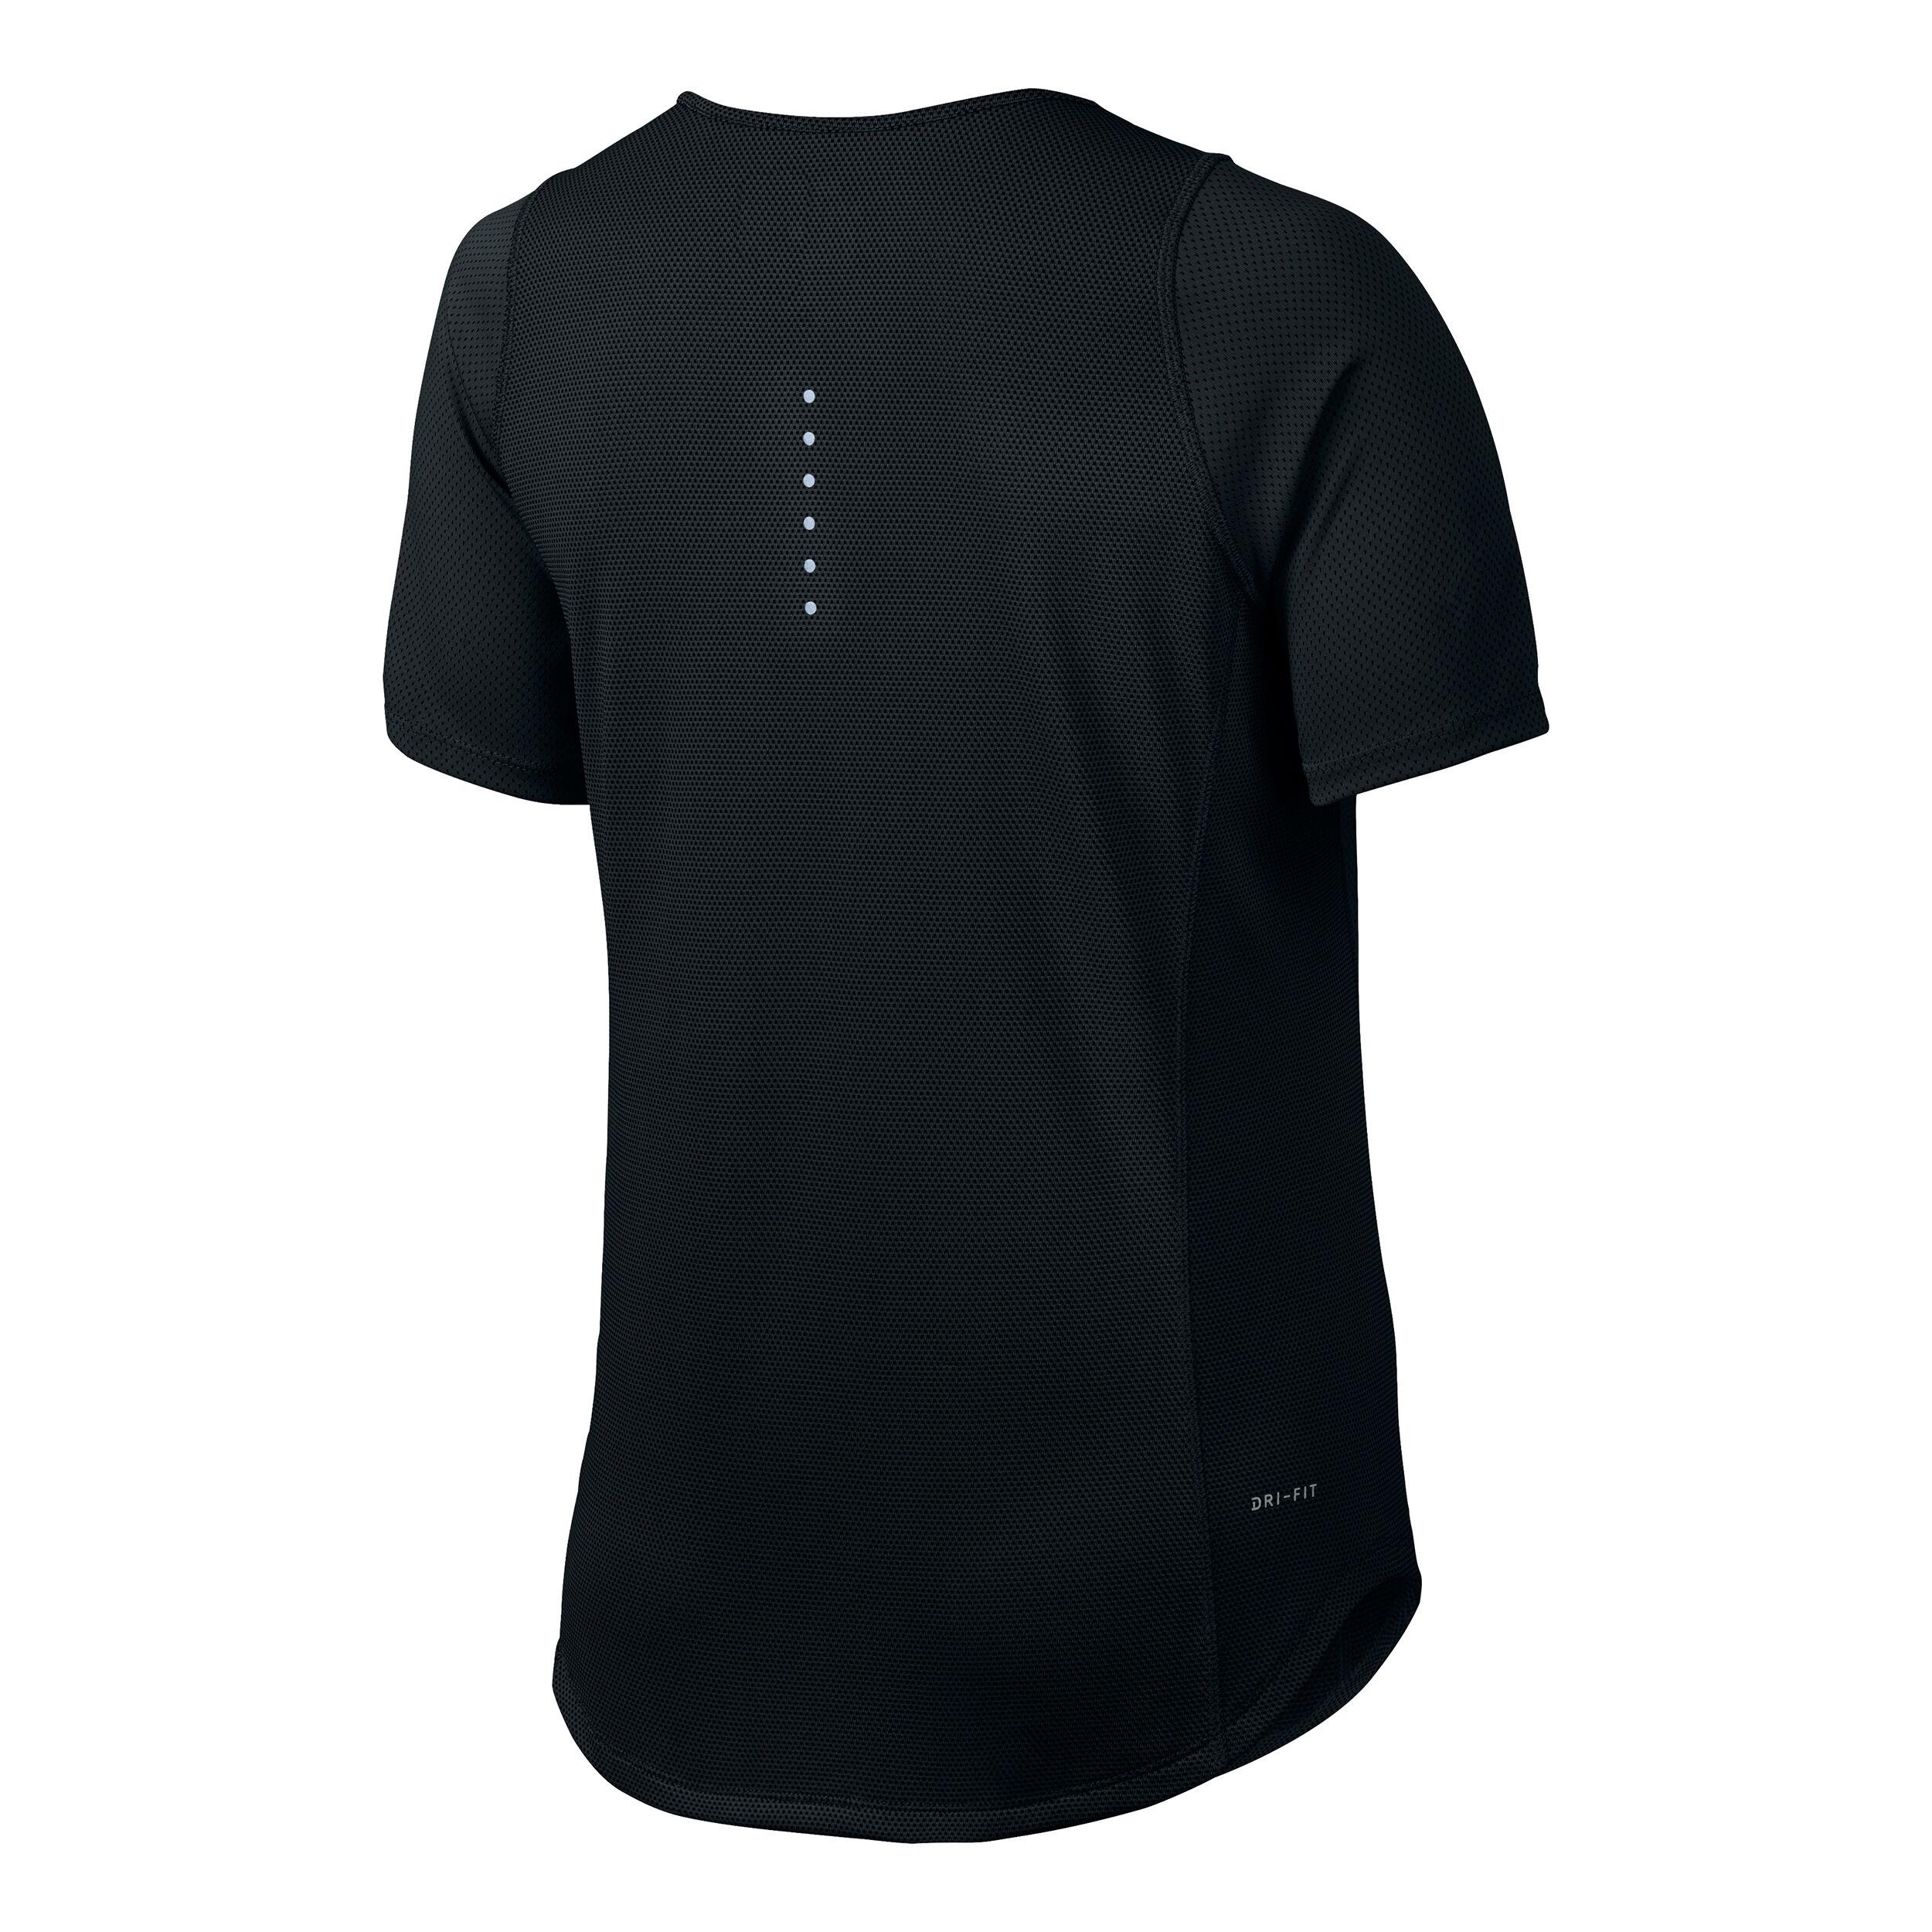 Nike Herren Shirt Dri Fit Tennis Shirt silber